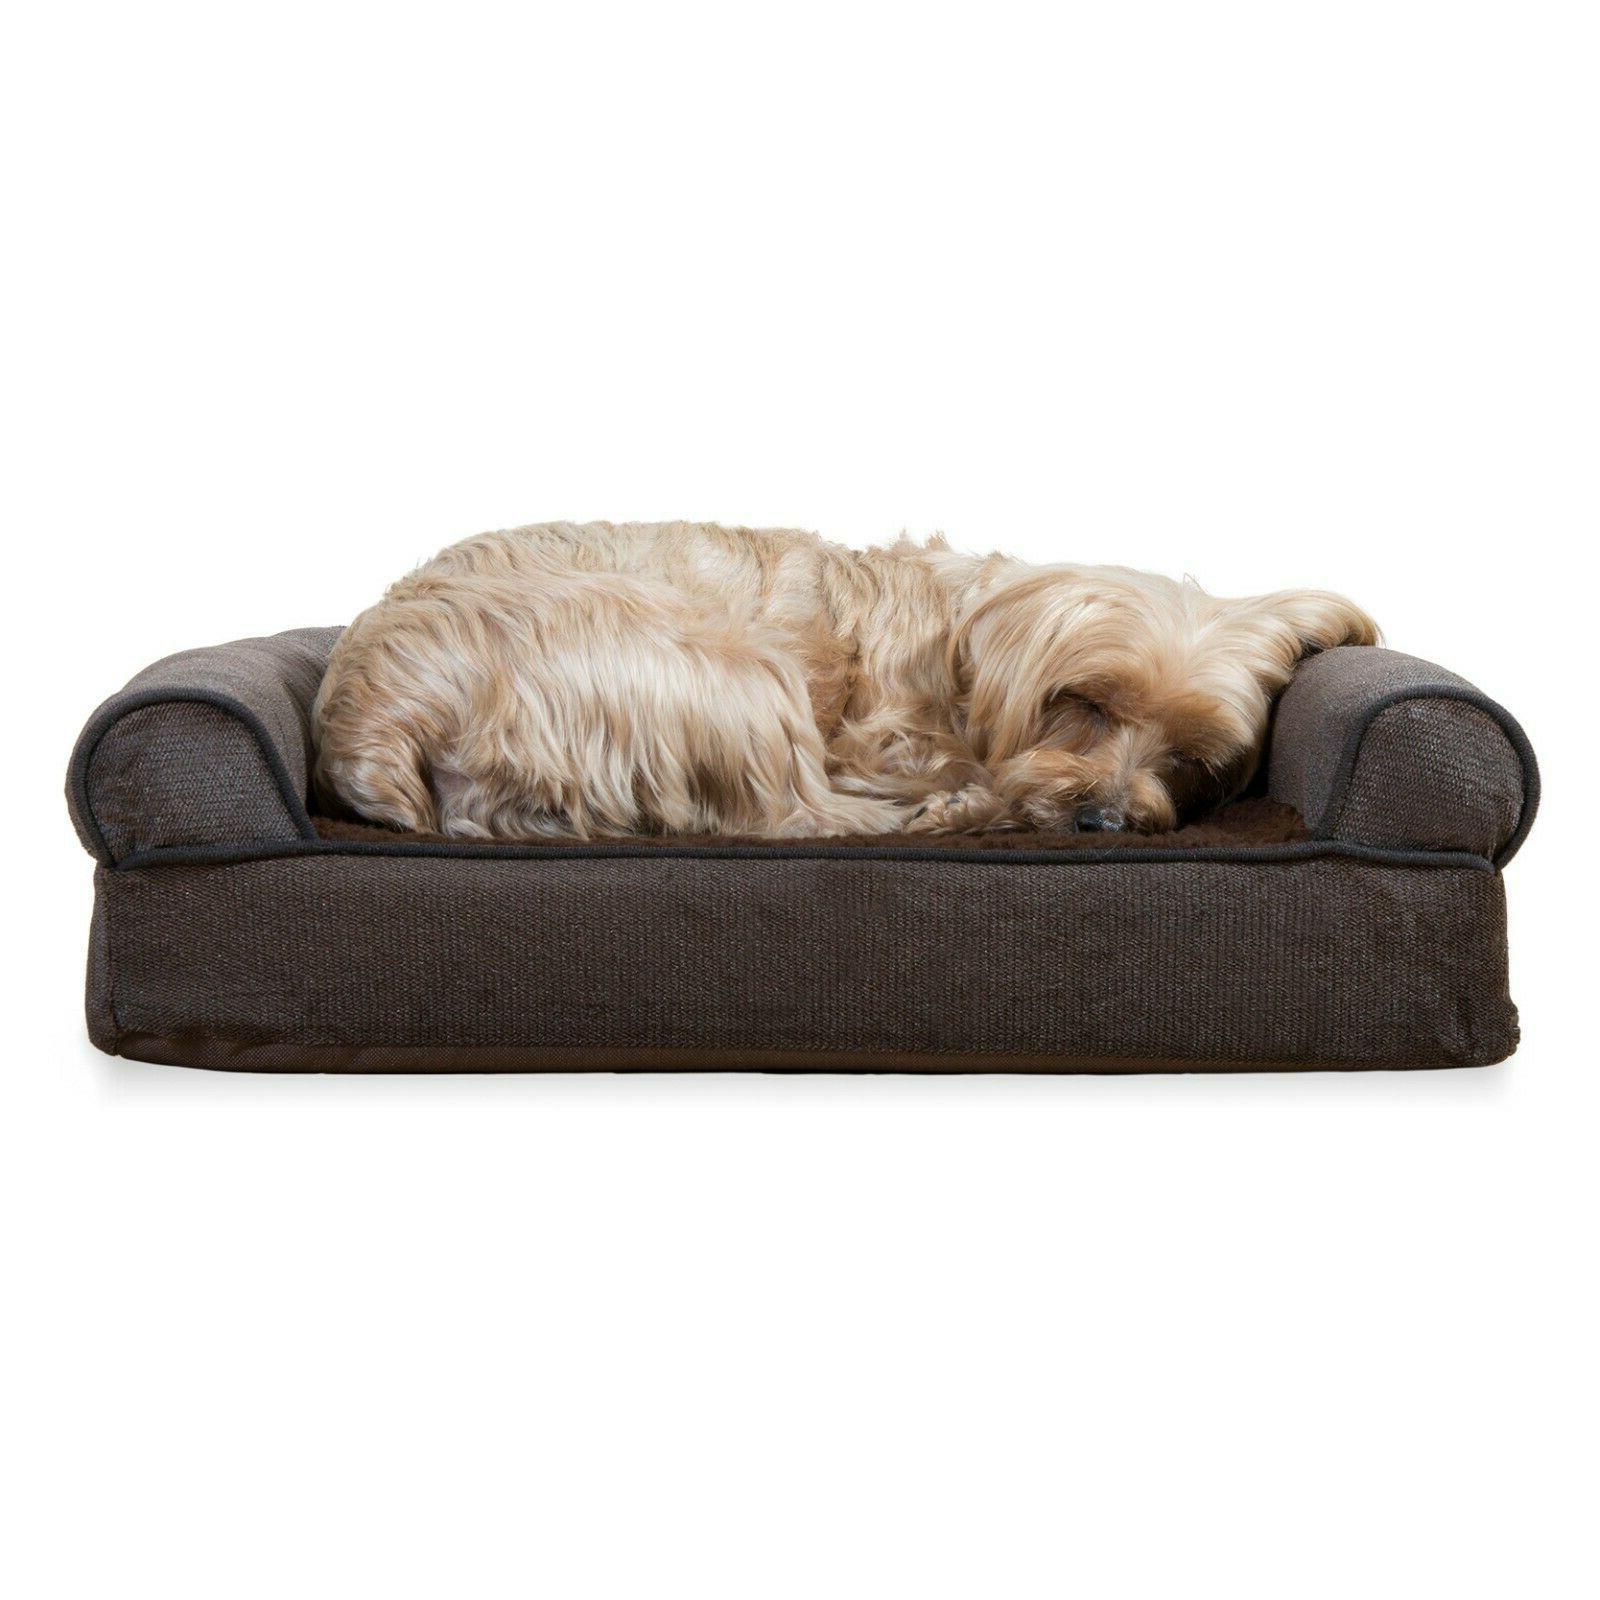 FurHaven Pet & Chenille Sofa Dog Bed